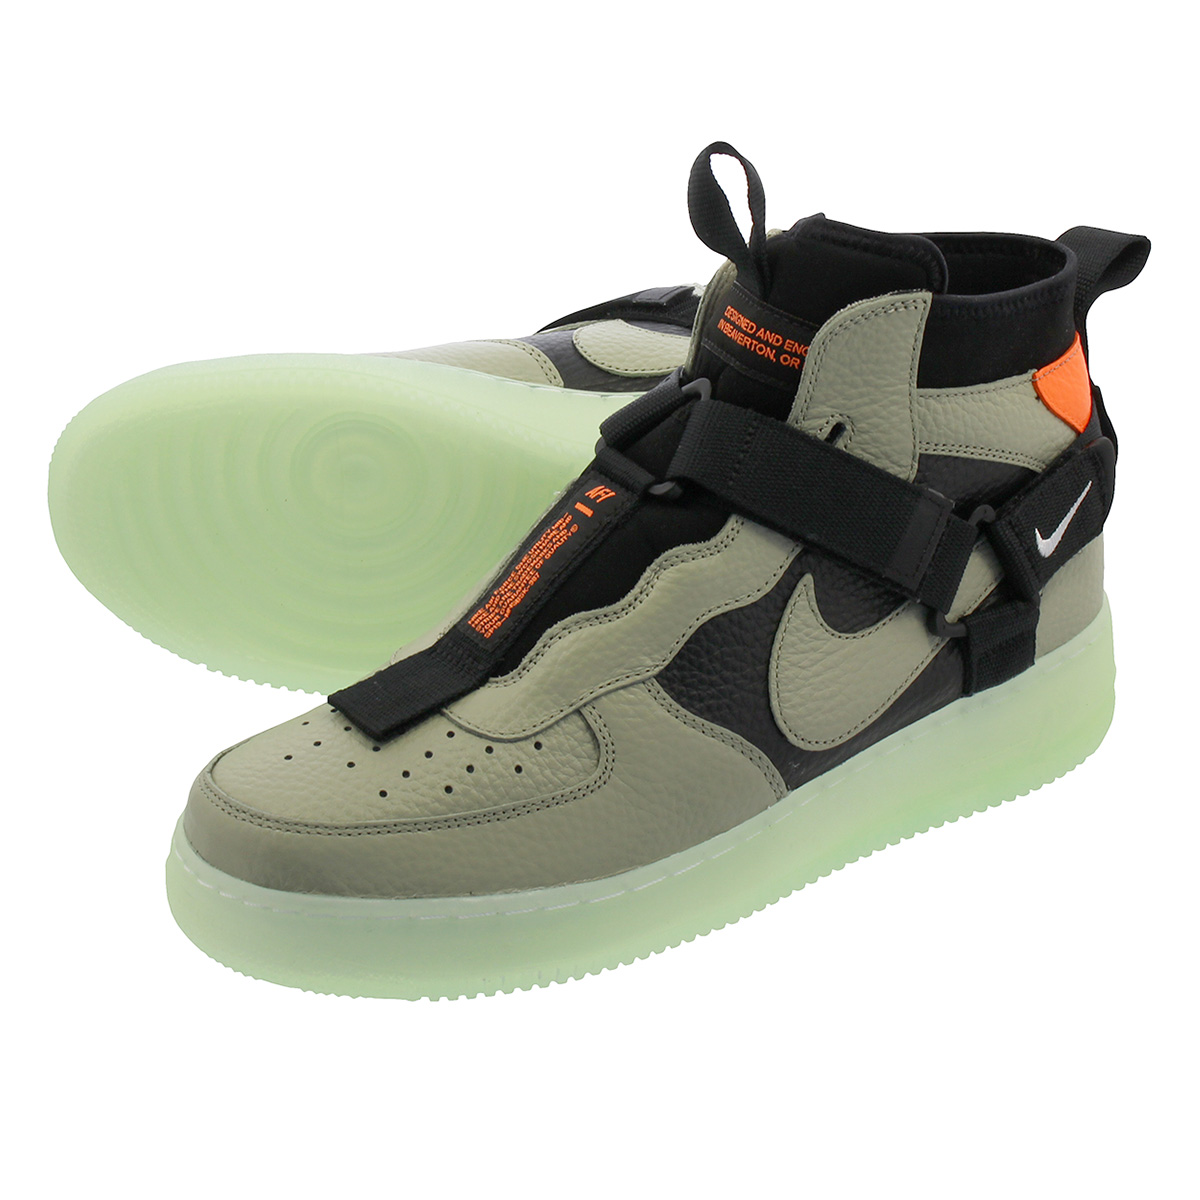 NIKE AIR FORCE 1 MID UTILITY Nike air force 1 mid utility SPRUCE FOGBLACKFROSTED SPRUCE aq9758 300